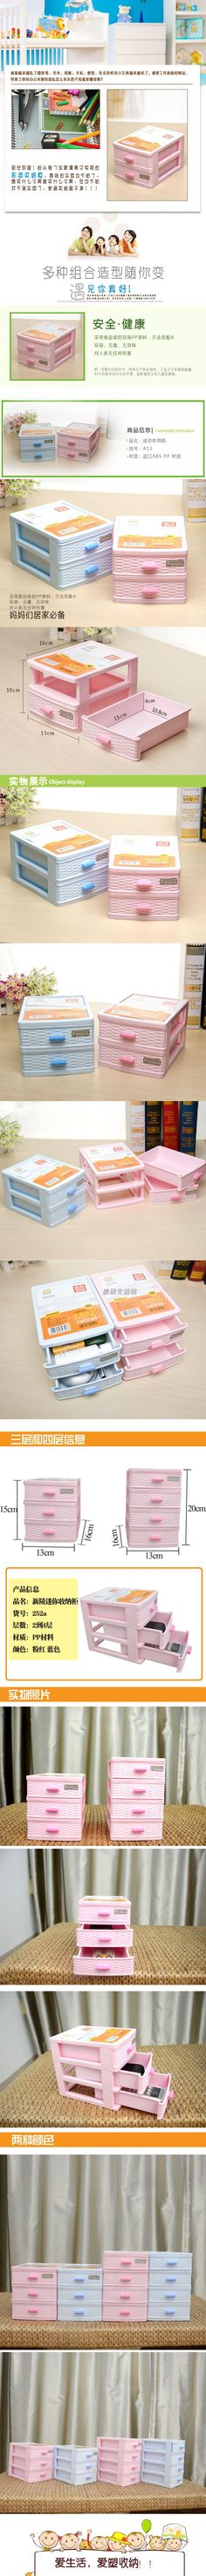 Free Shipping 1set 4 Layer Fashion S Pink Mini Jewelry Drawer Plastic Desktop Cabinets Parts Storage Box Caixa De Armazenamento   #StorageCabinet